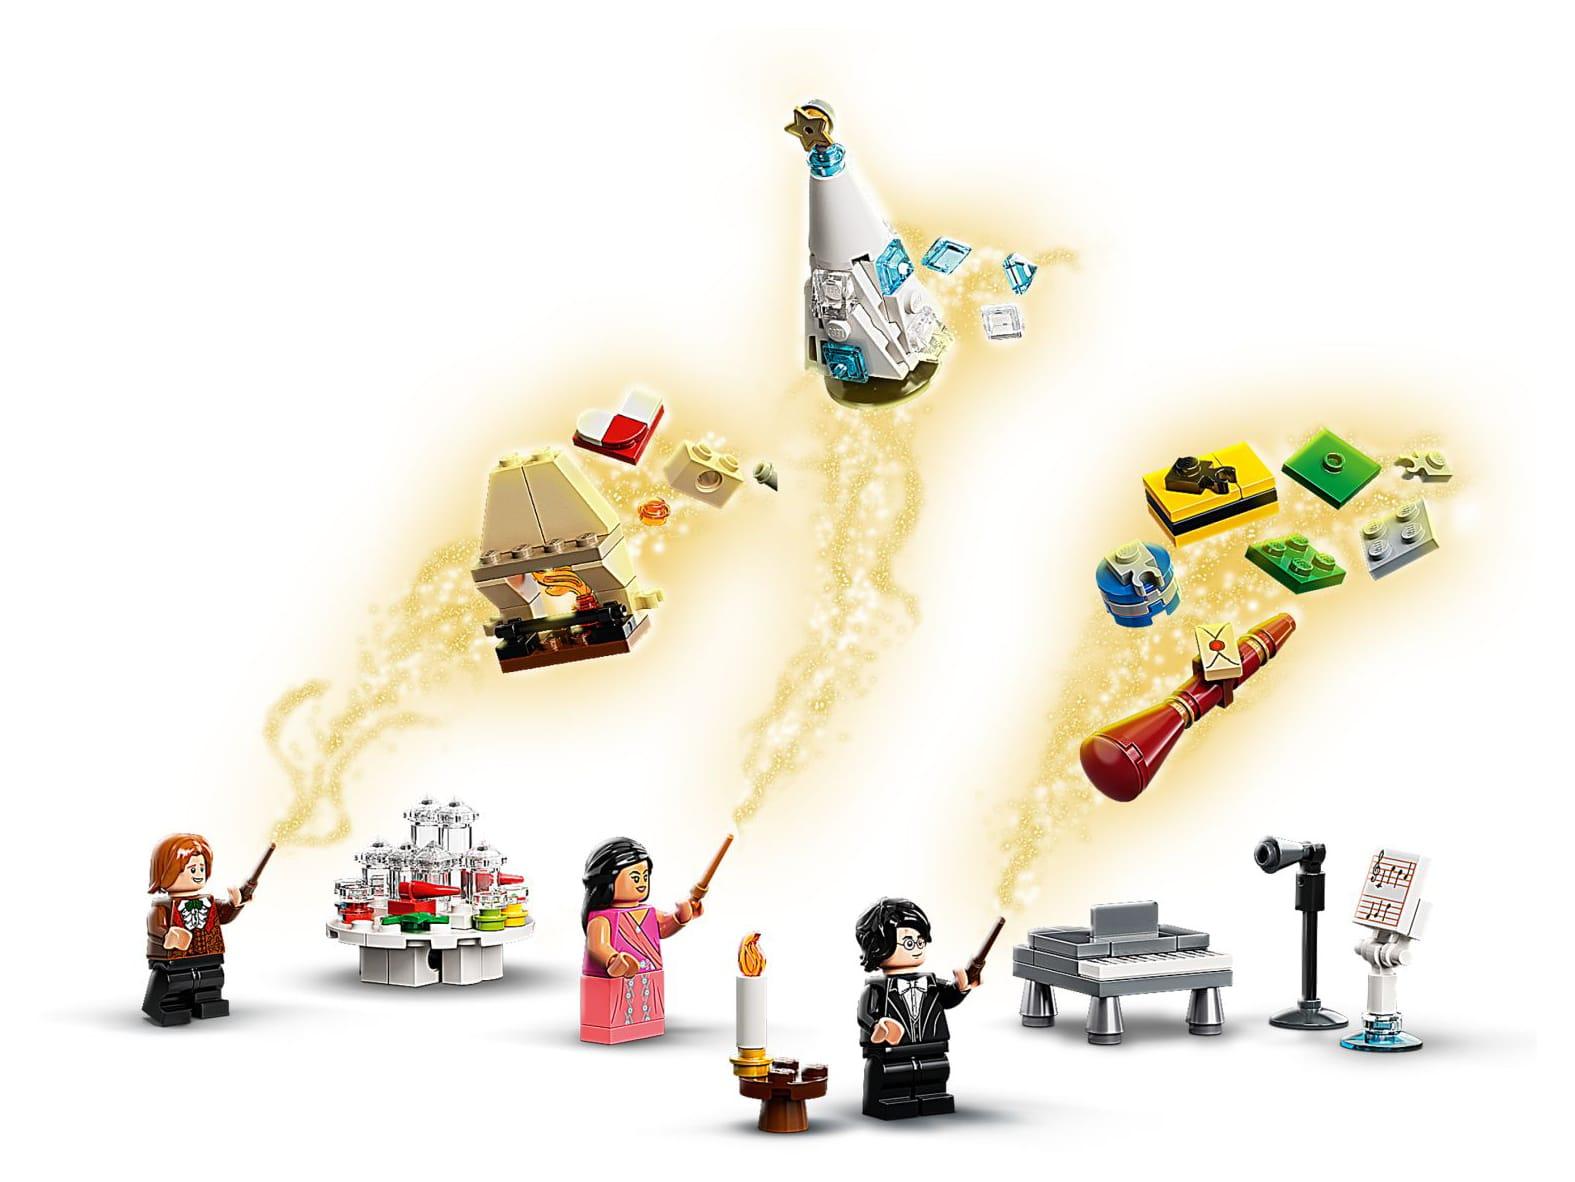 LEGO Harry Potter 75981 Advent Calendar 2020